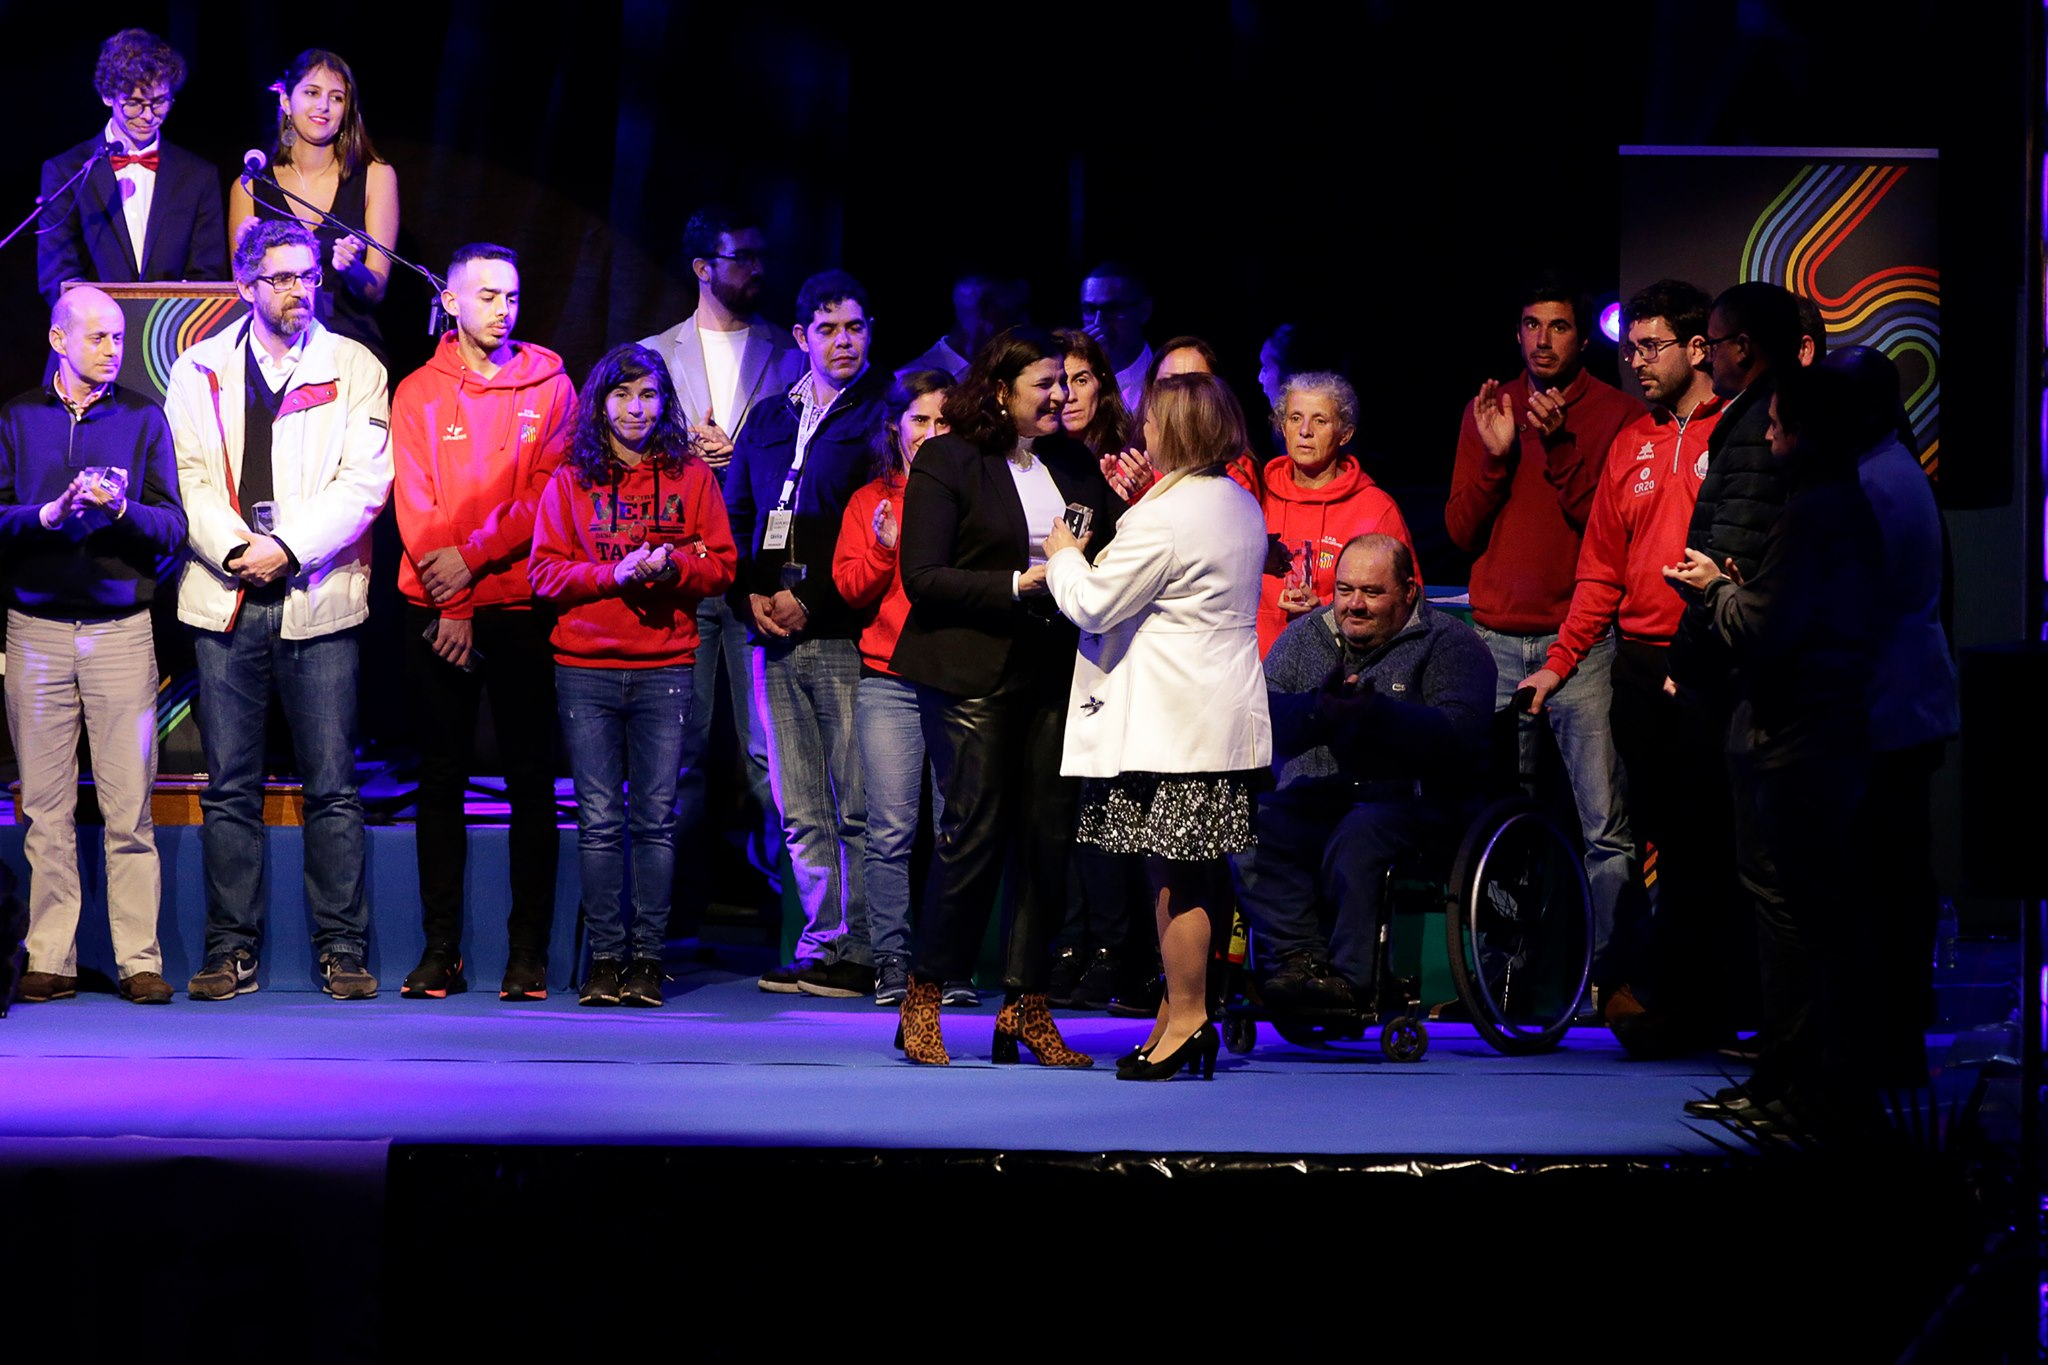 ACeS Sotavento recebeu Prémio Alto Prestigio_Entidade na Gala do Desporto de Tavira